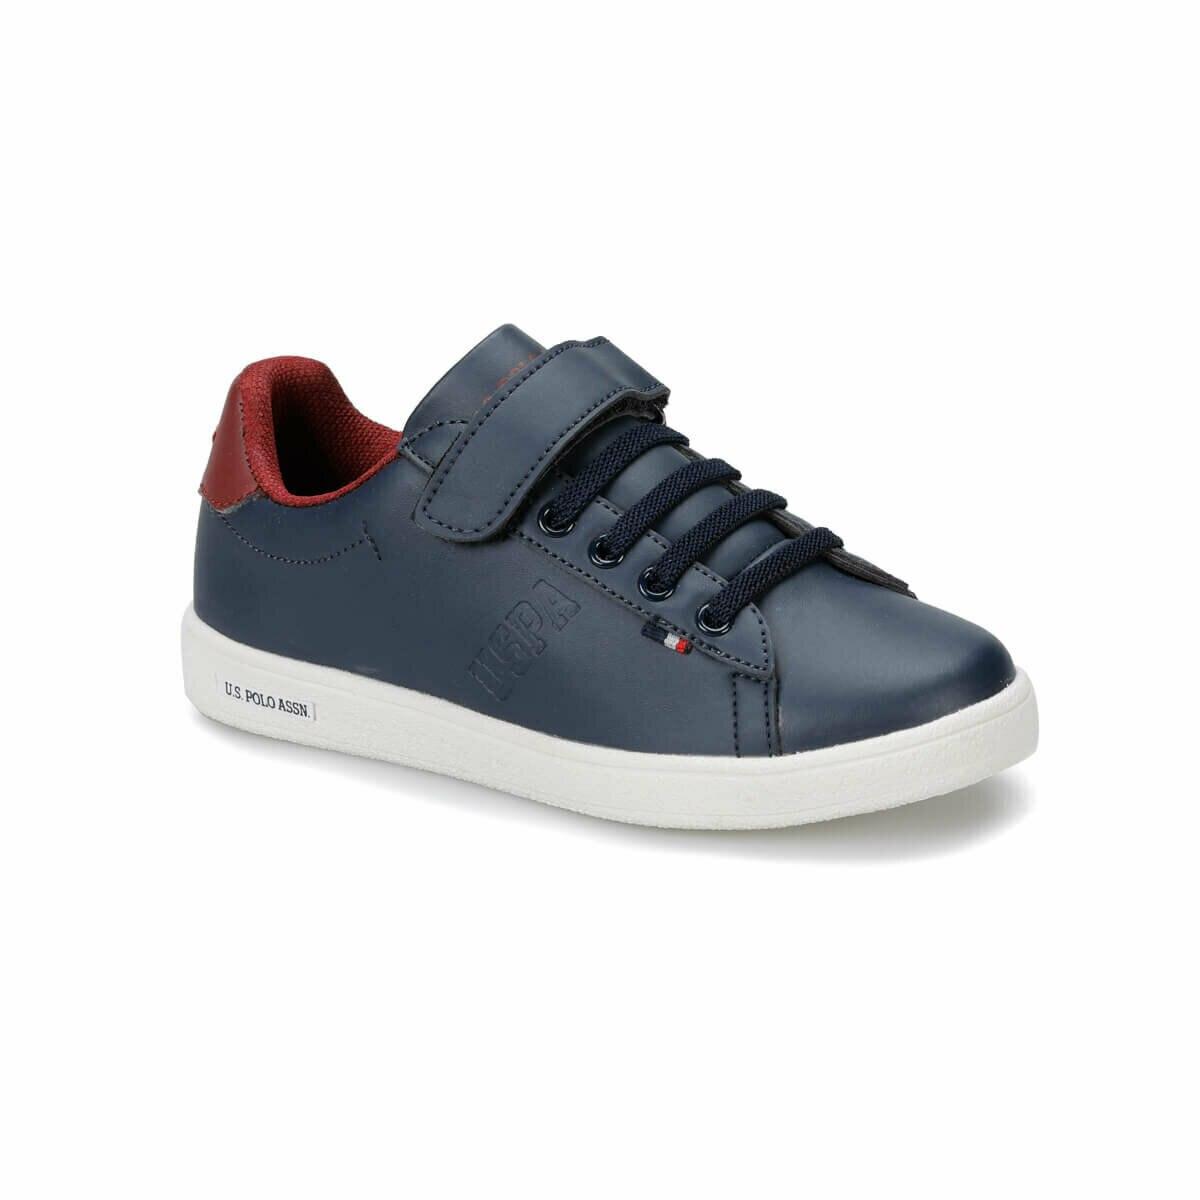 FLO FRANCO Navy Blue Male Child Sneaker Shoes U.S. POLO ASSN.